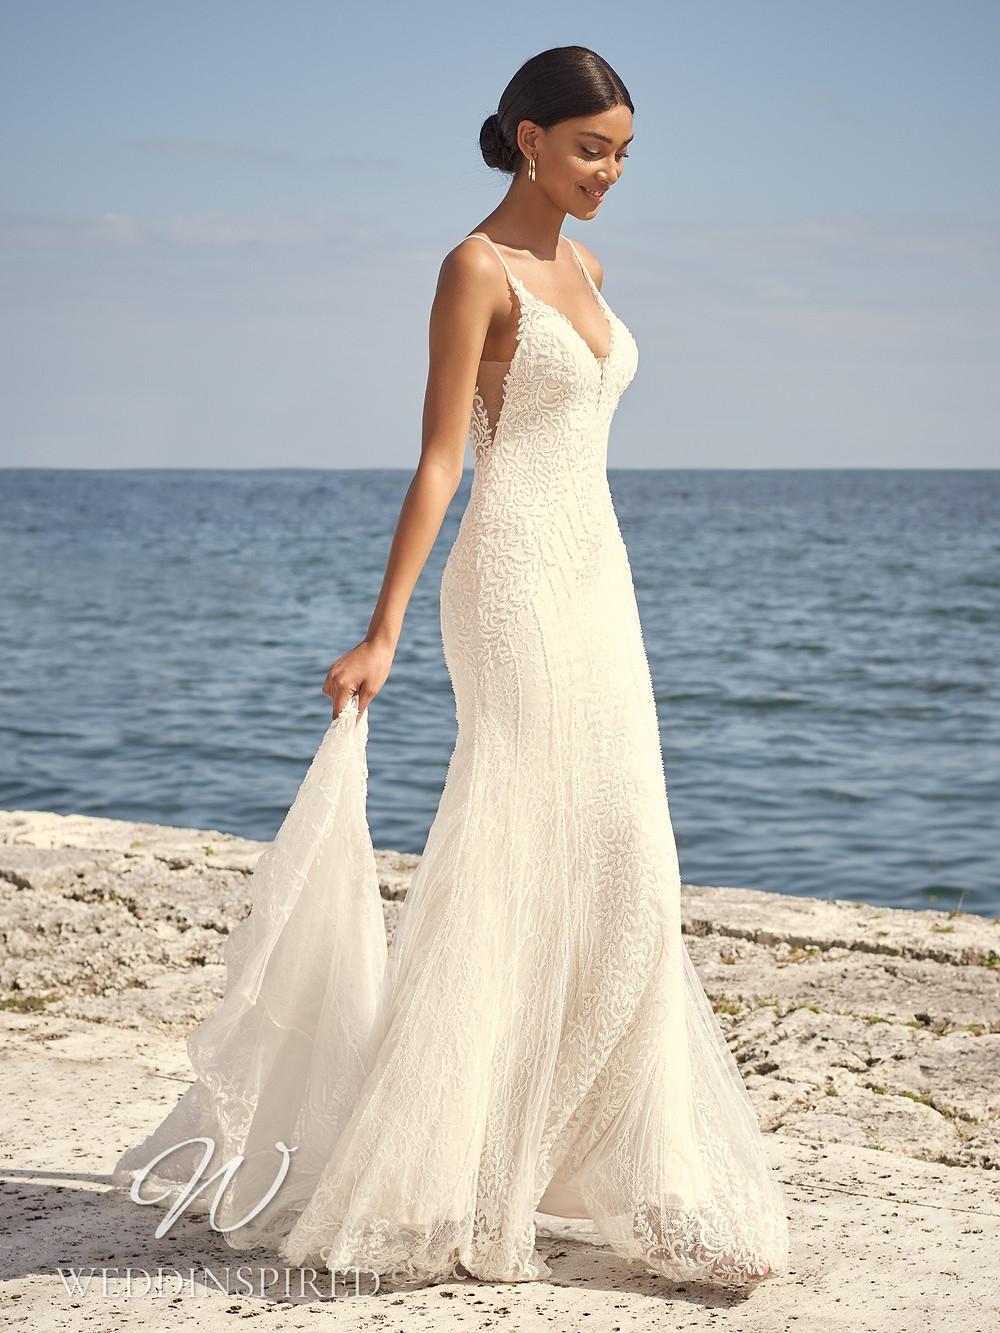 A Sottero & Midgley 2021 lace mermaid wedding dress with a v neck